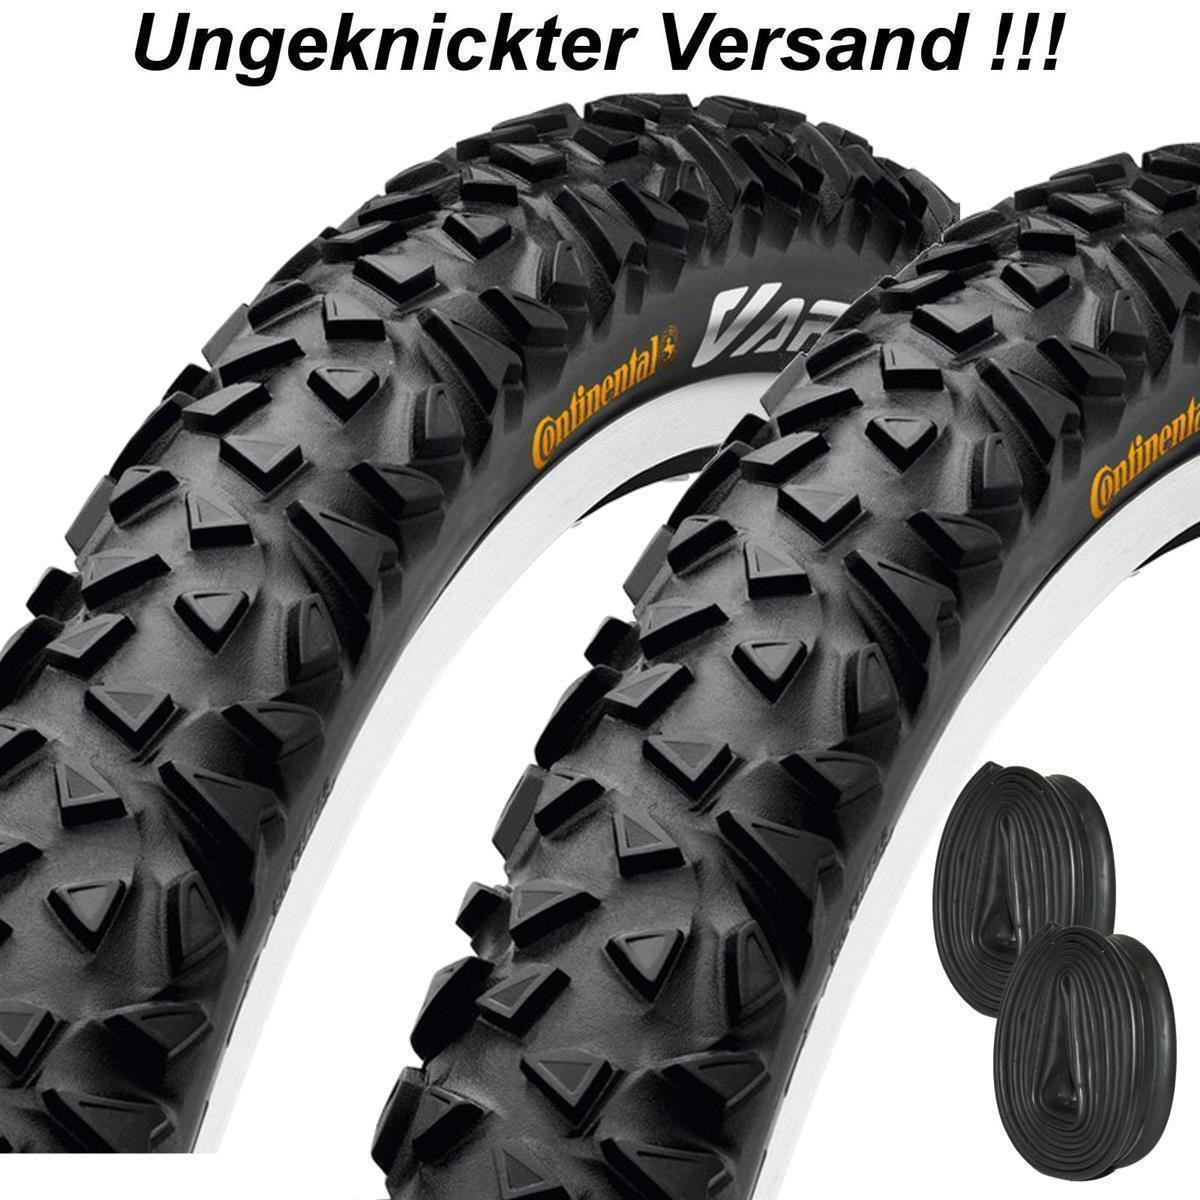 2x Continental Fahrrad Reifen Vapor 26x2.10 54-559 MTB Mantel m/o Conti Schlauch